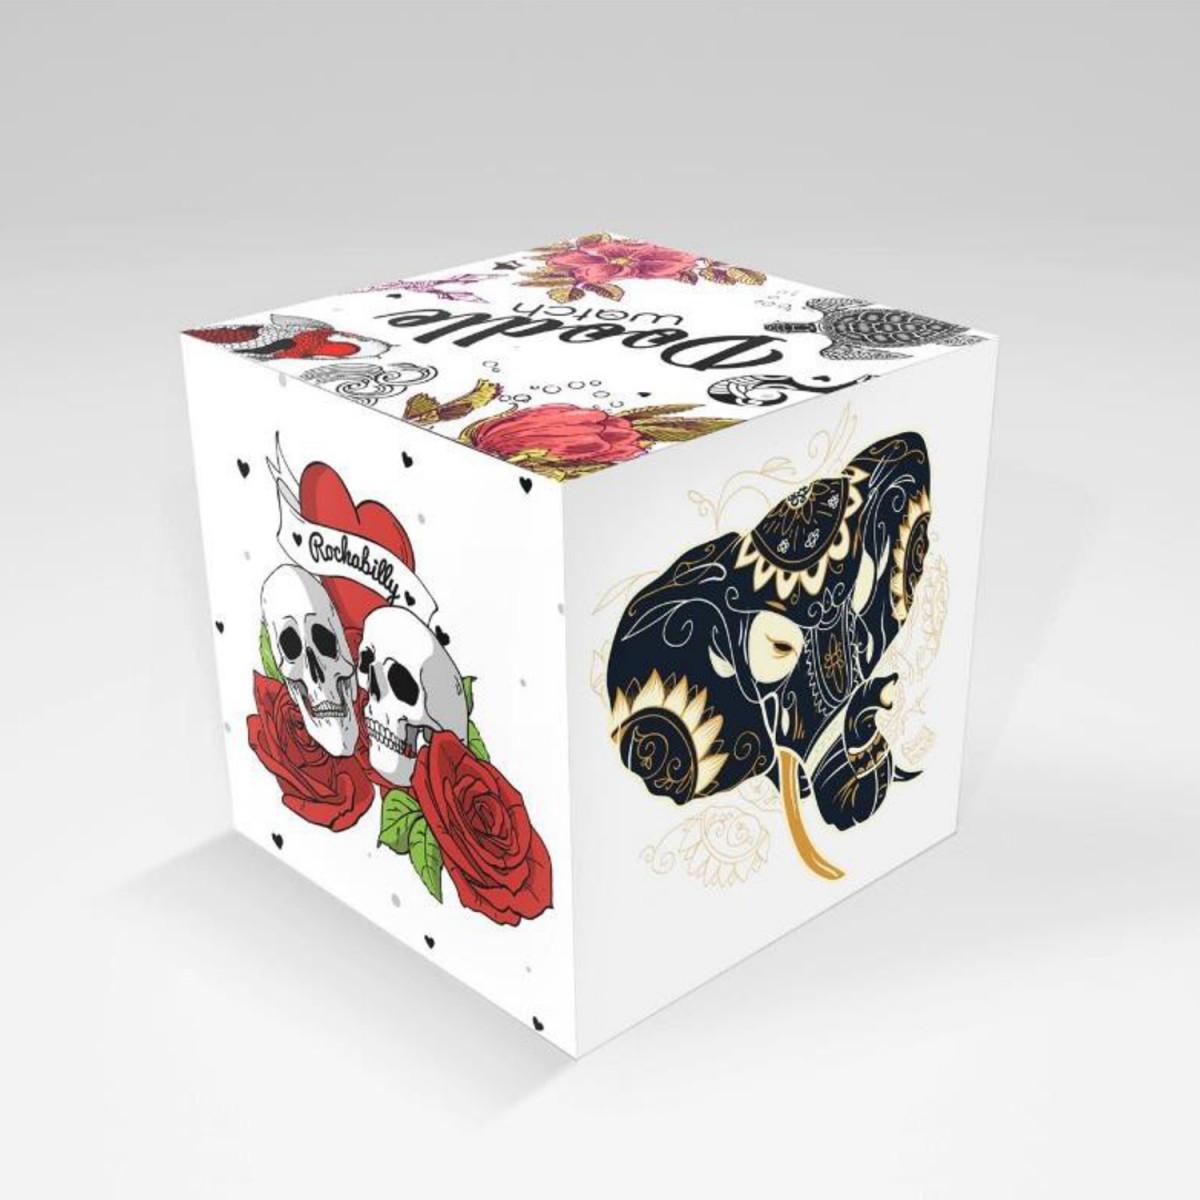 Montre Homme Doodle Street Fighter Mood cadran noir - DO42004